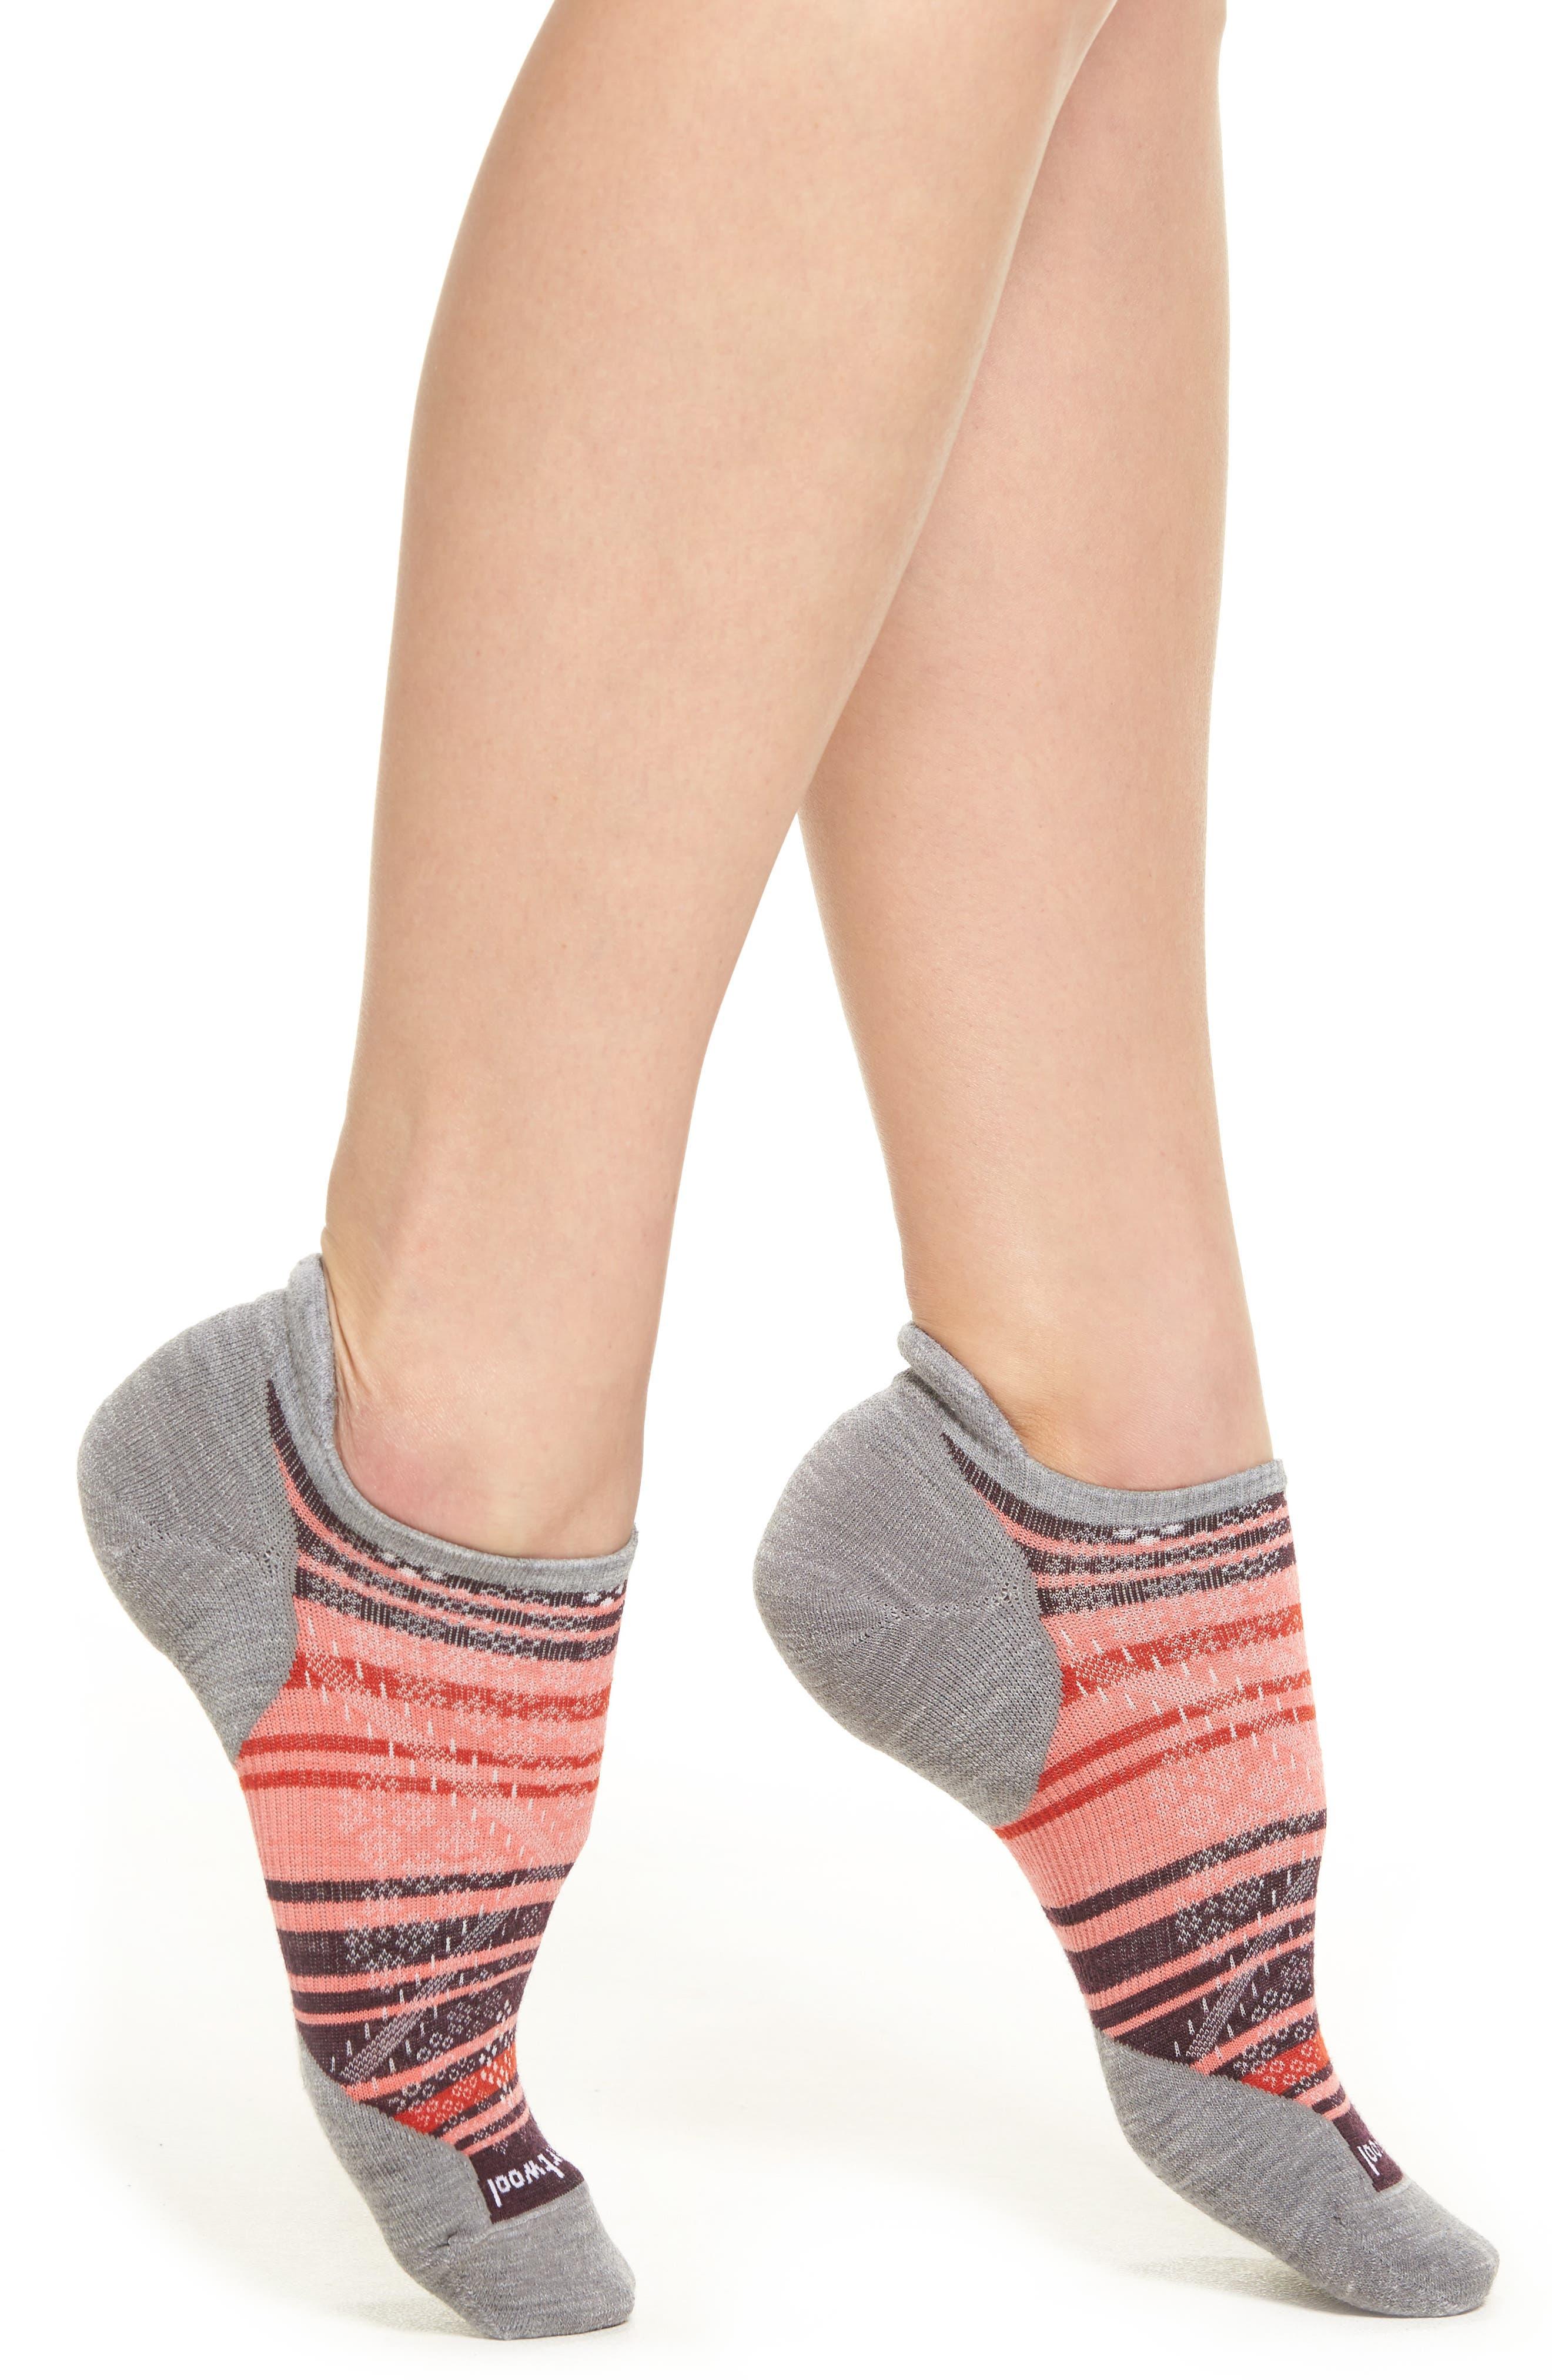 PhD Run Elite Micro No-Show Socks,                         Main,                         color,